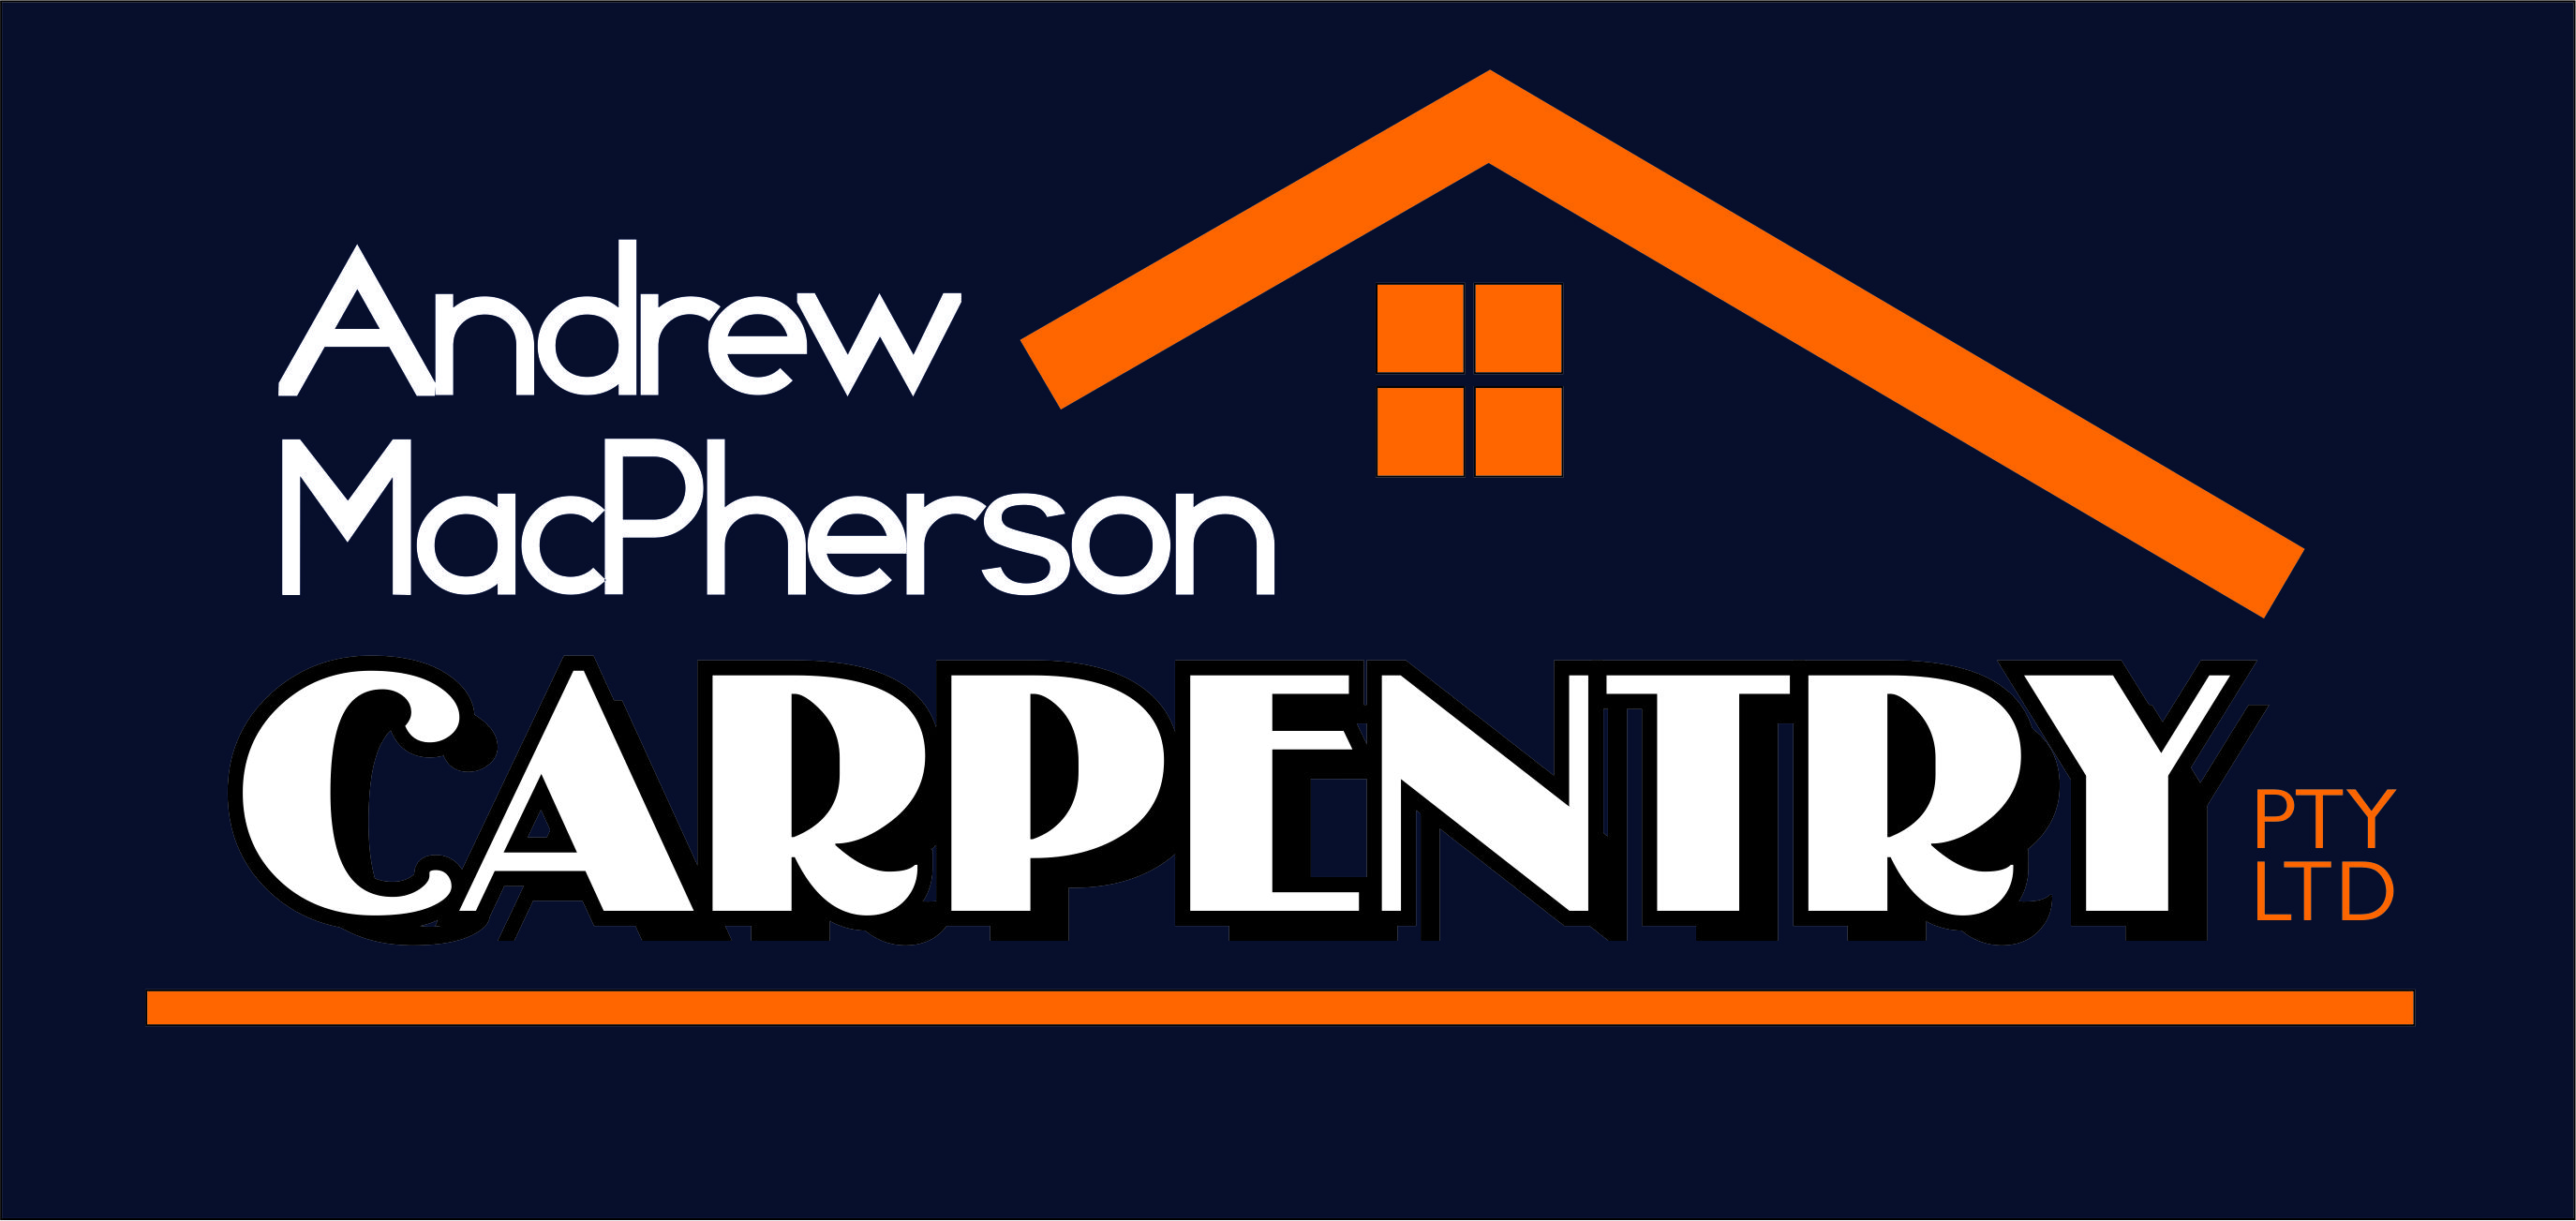 andrew macpherson carpentry logo